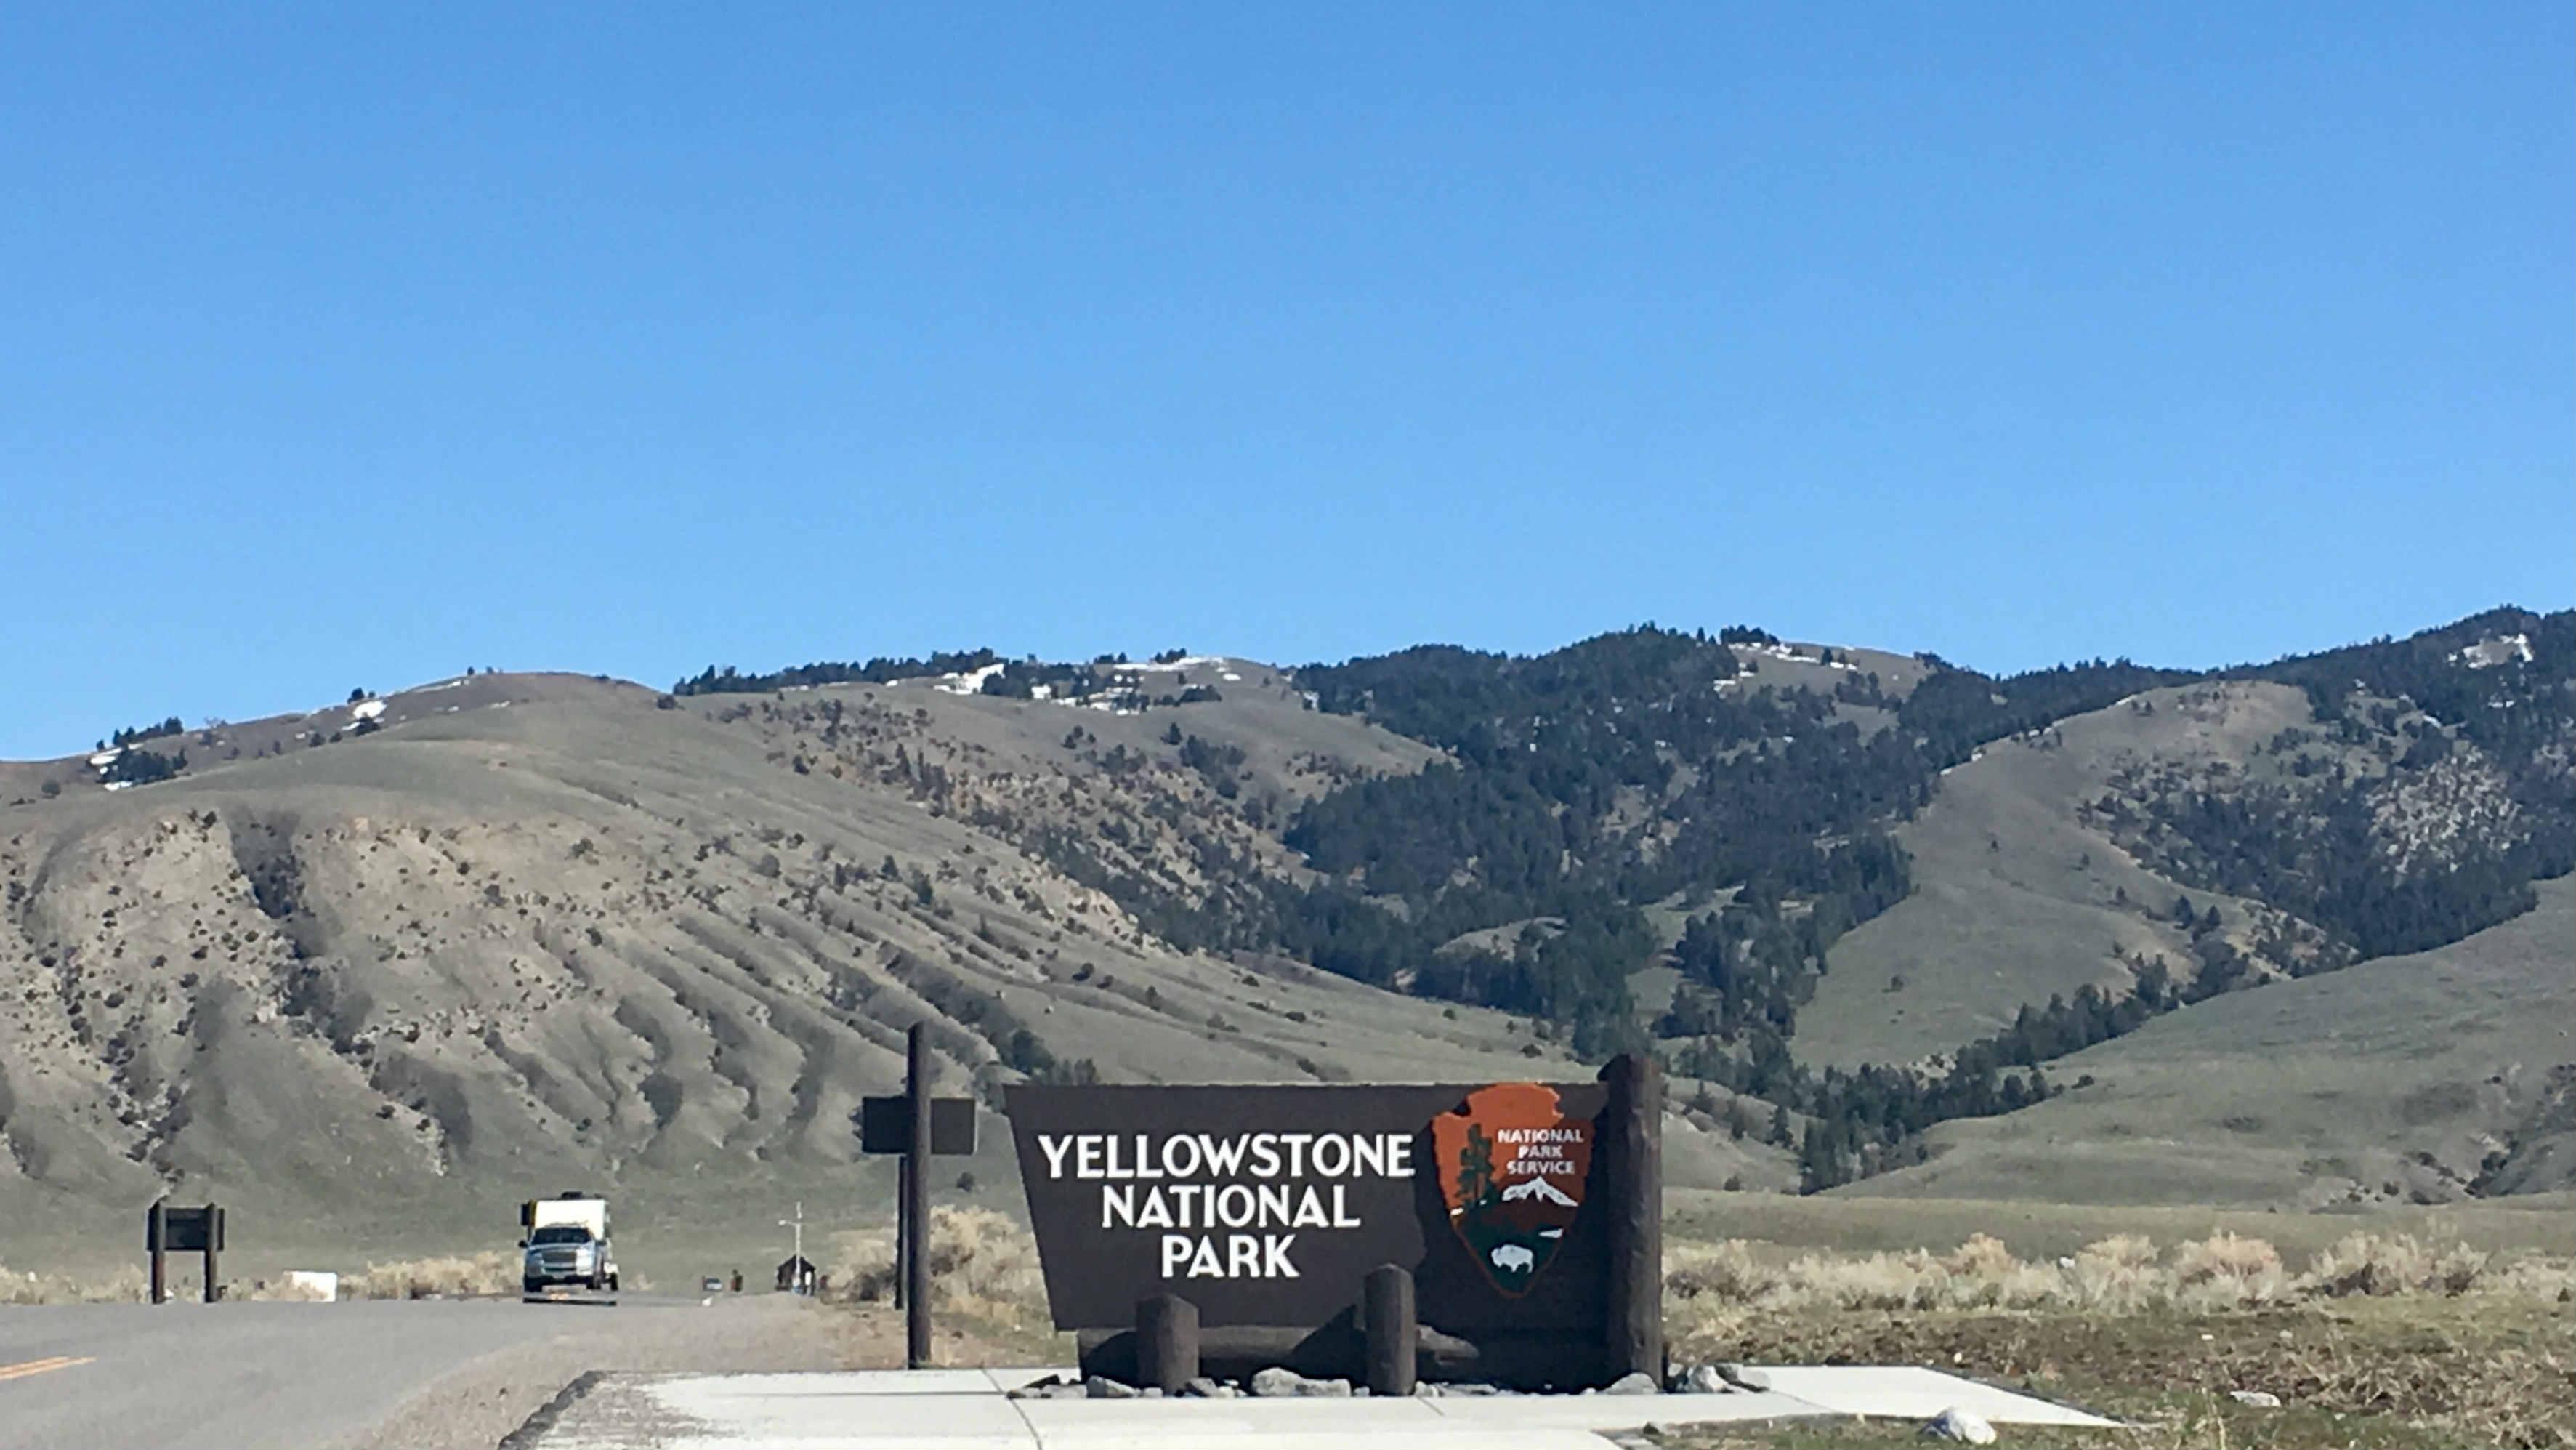 fire danger  u0026 39 high u0026 39  in yellowstone national park